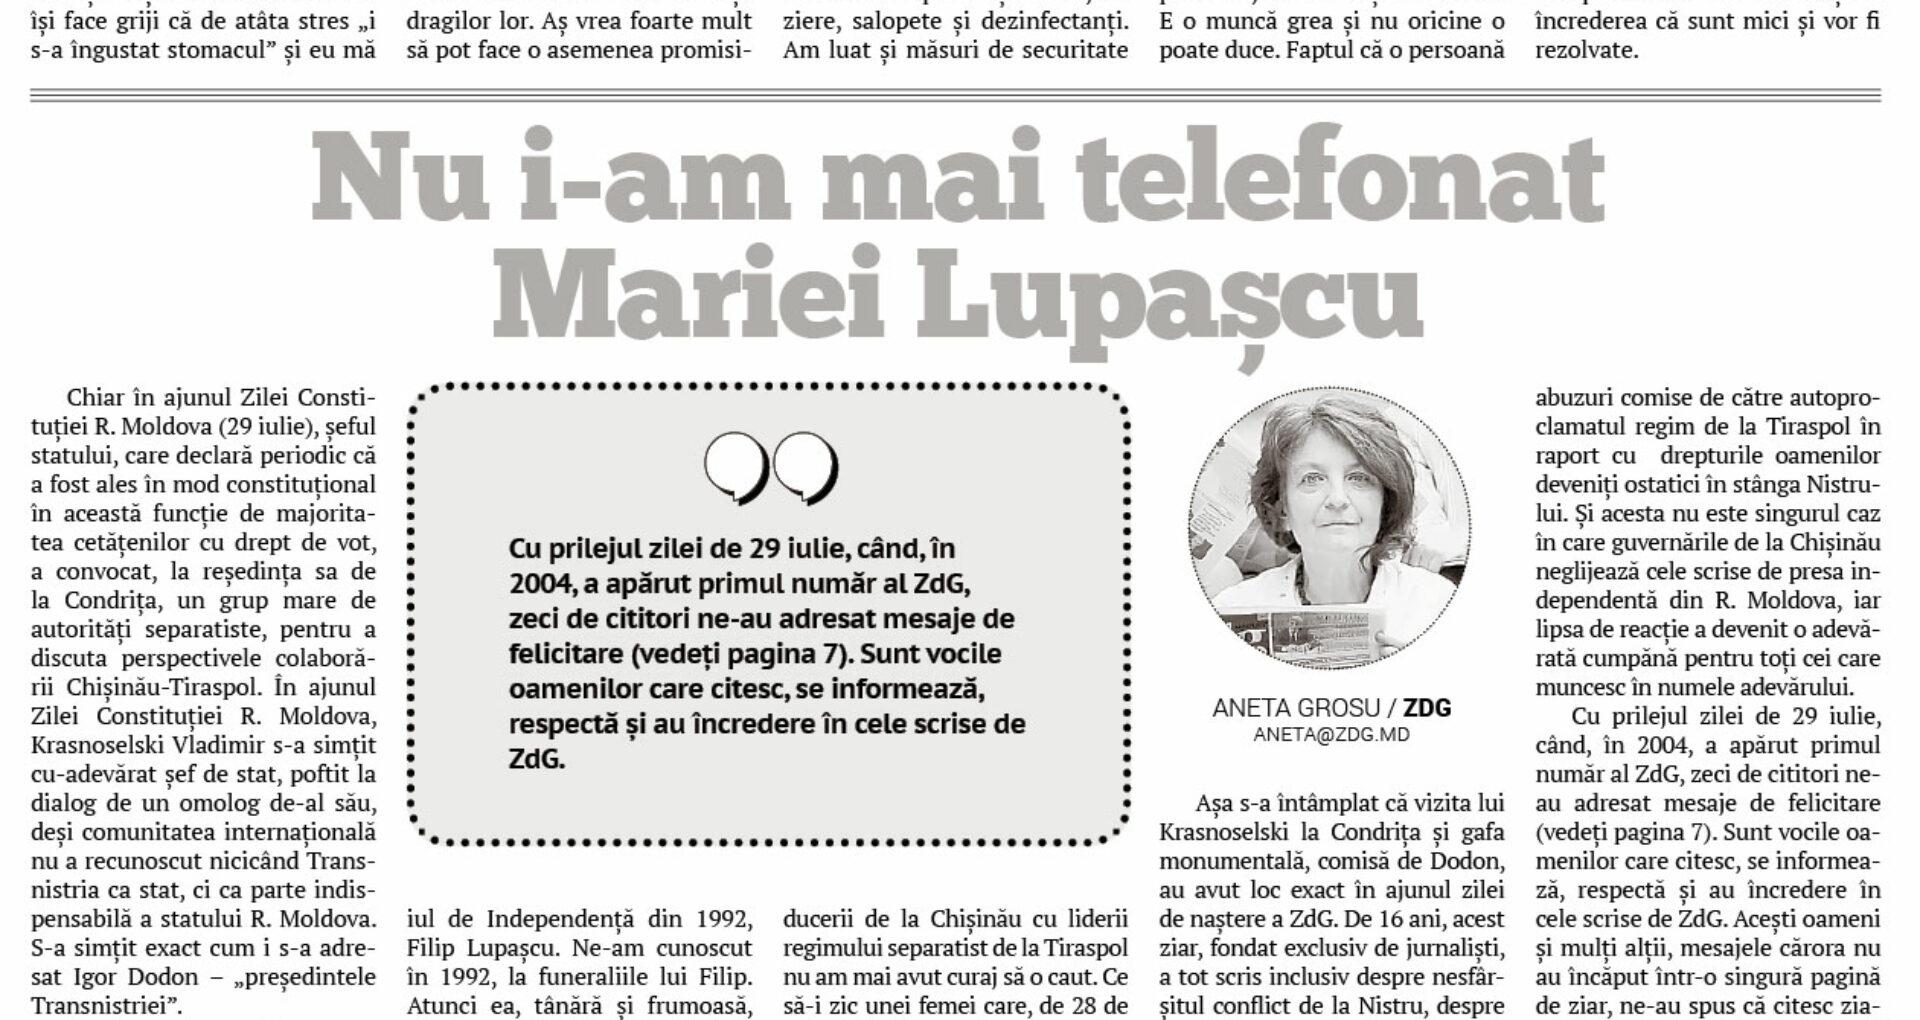 Nu i-am mai telefonat  Mariei Lupașcu